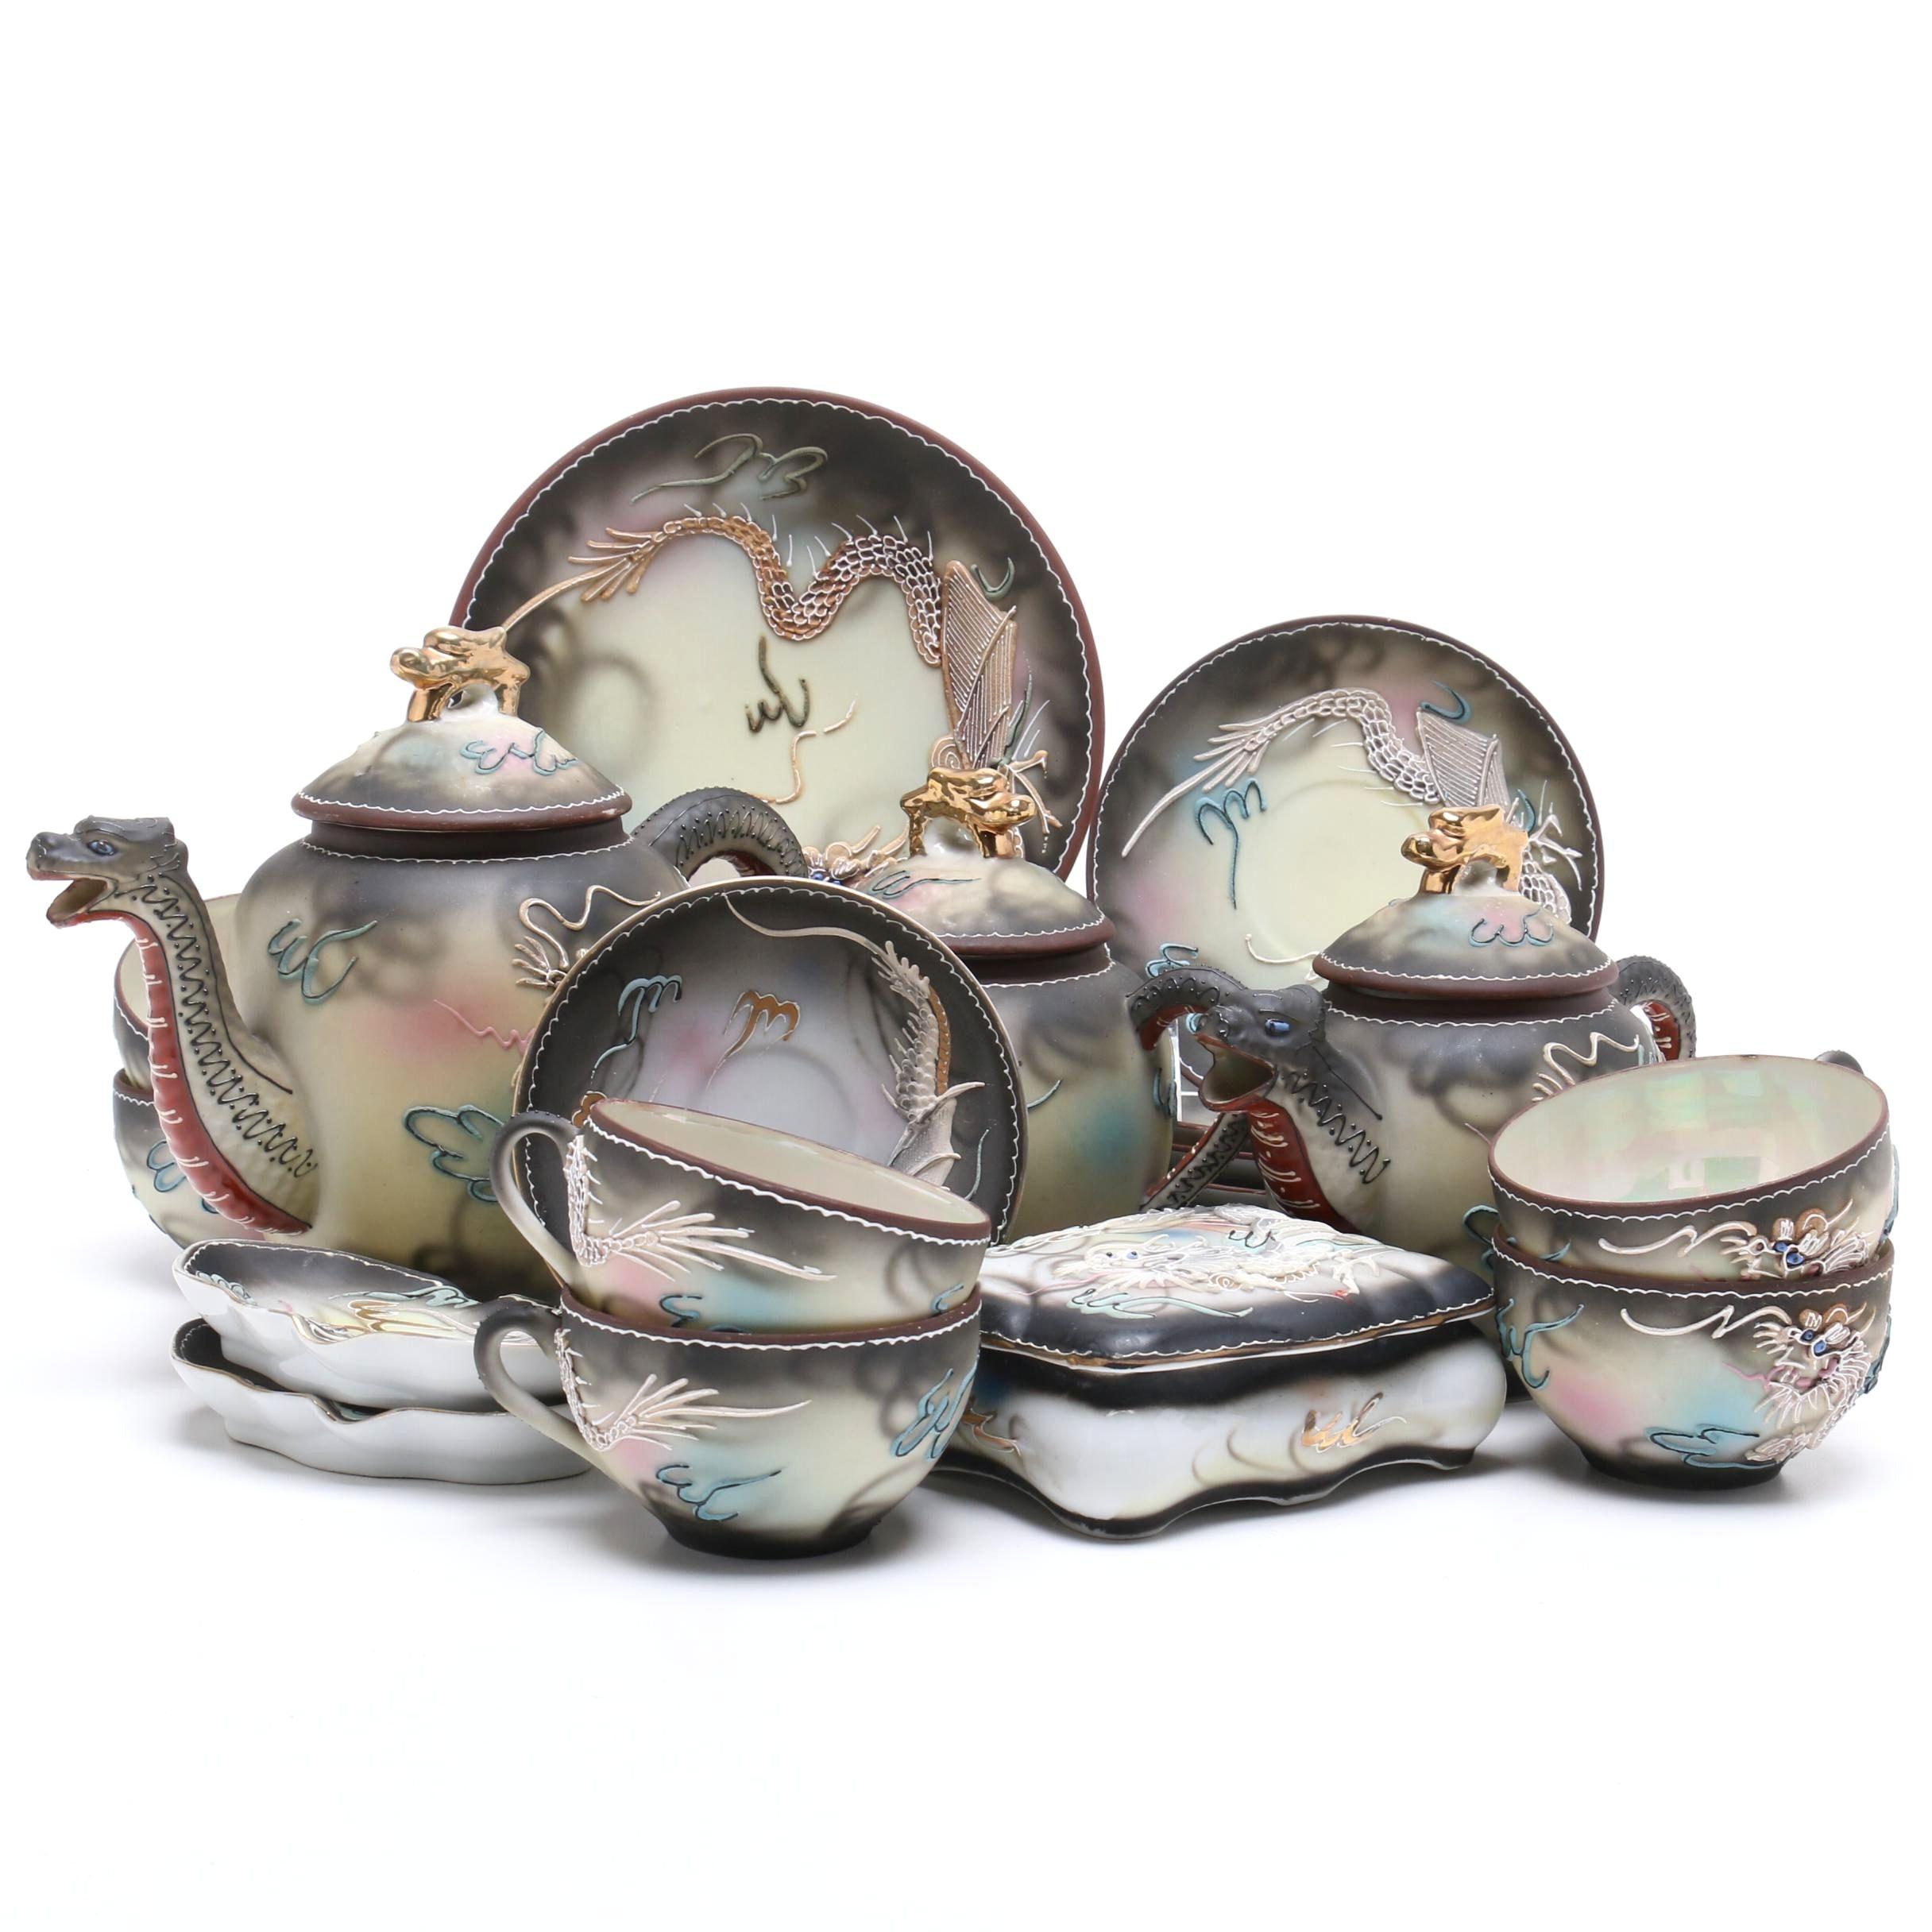 Hand Painted Japanese Moriage Dragonware Tea Set by Takito